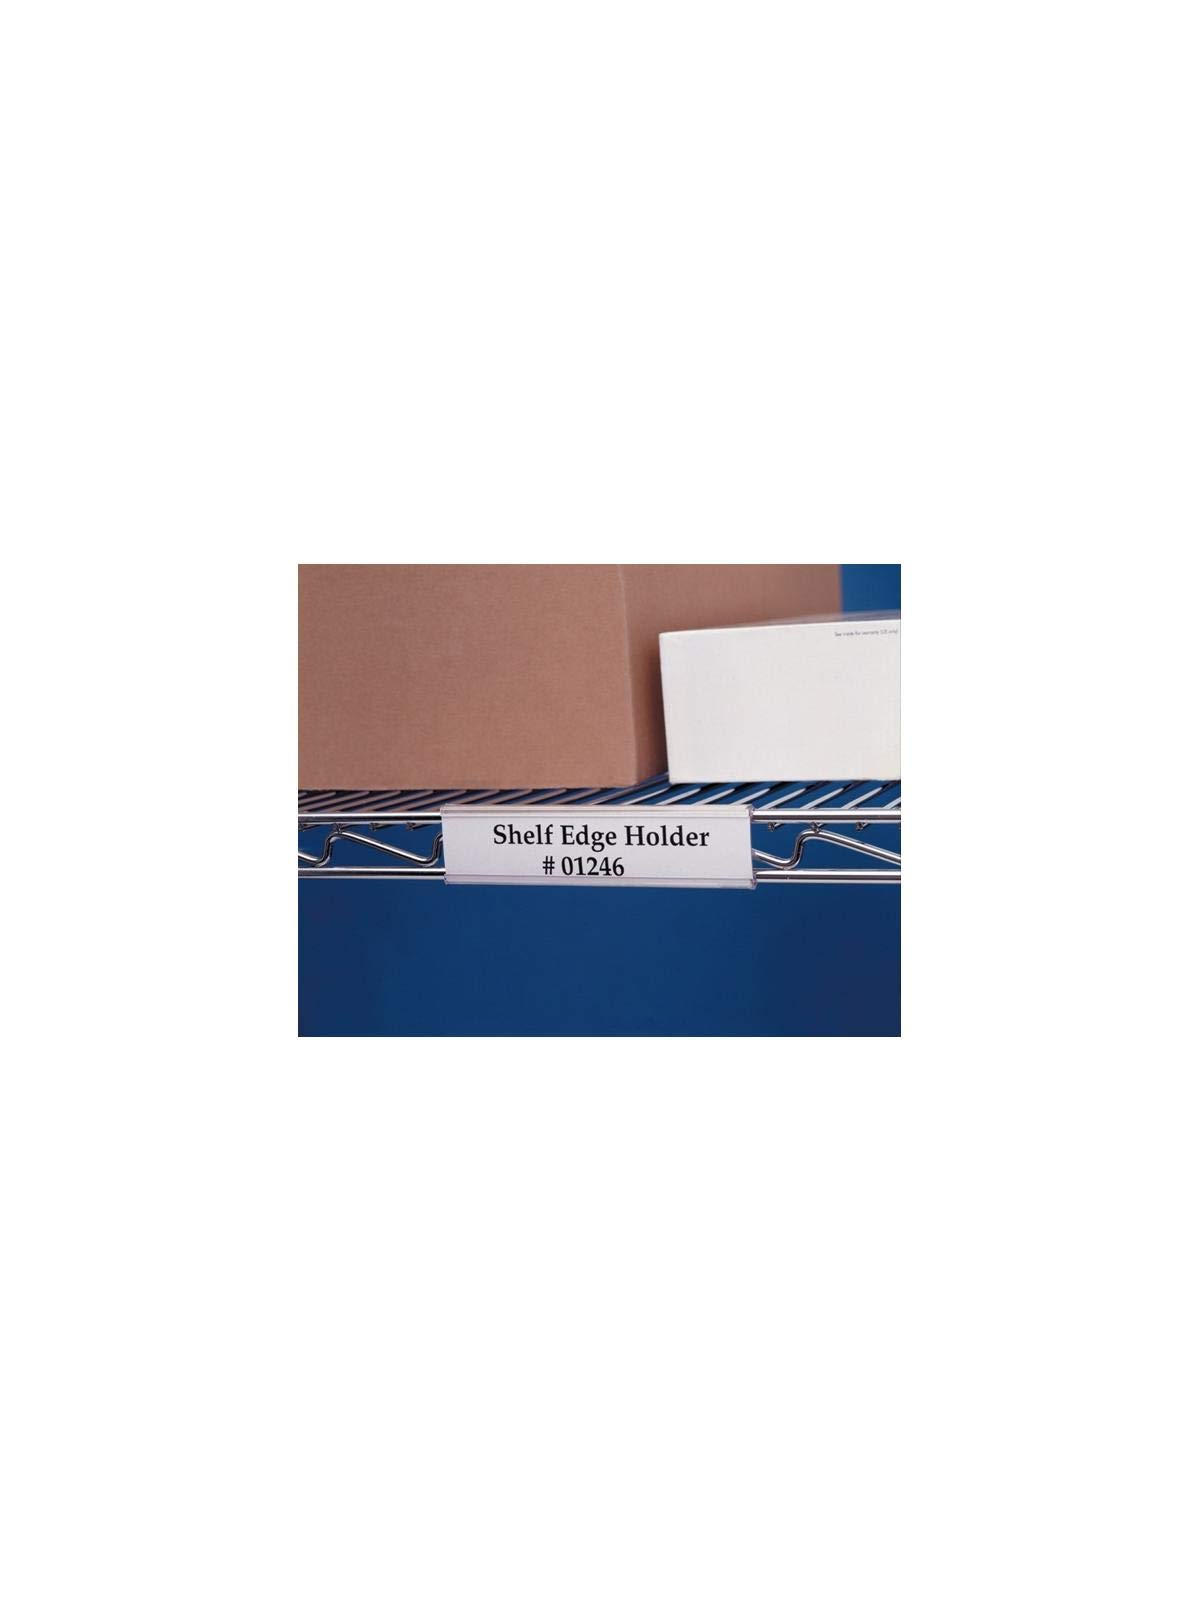 Aigner Label Holder - Aigner Wire-Rac Label Holders 3''L. 25 per pk - WR-1253 by Aigner Label Holder